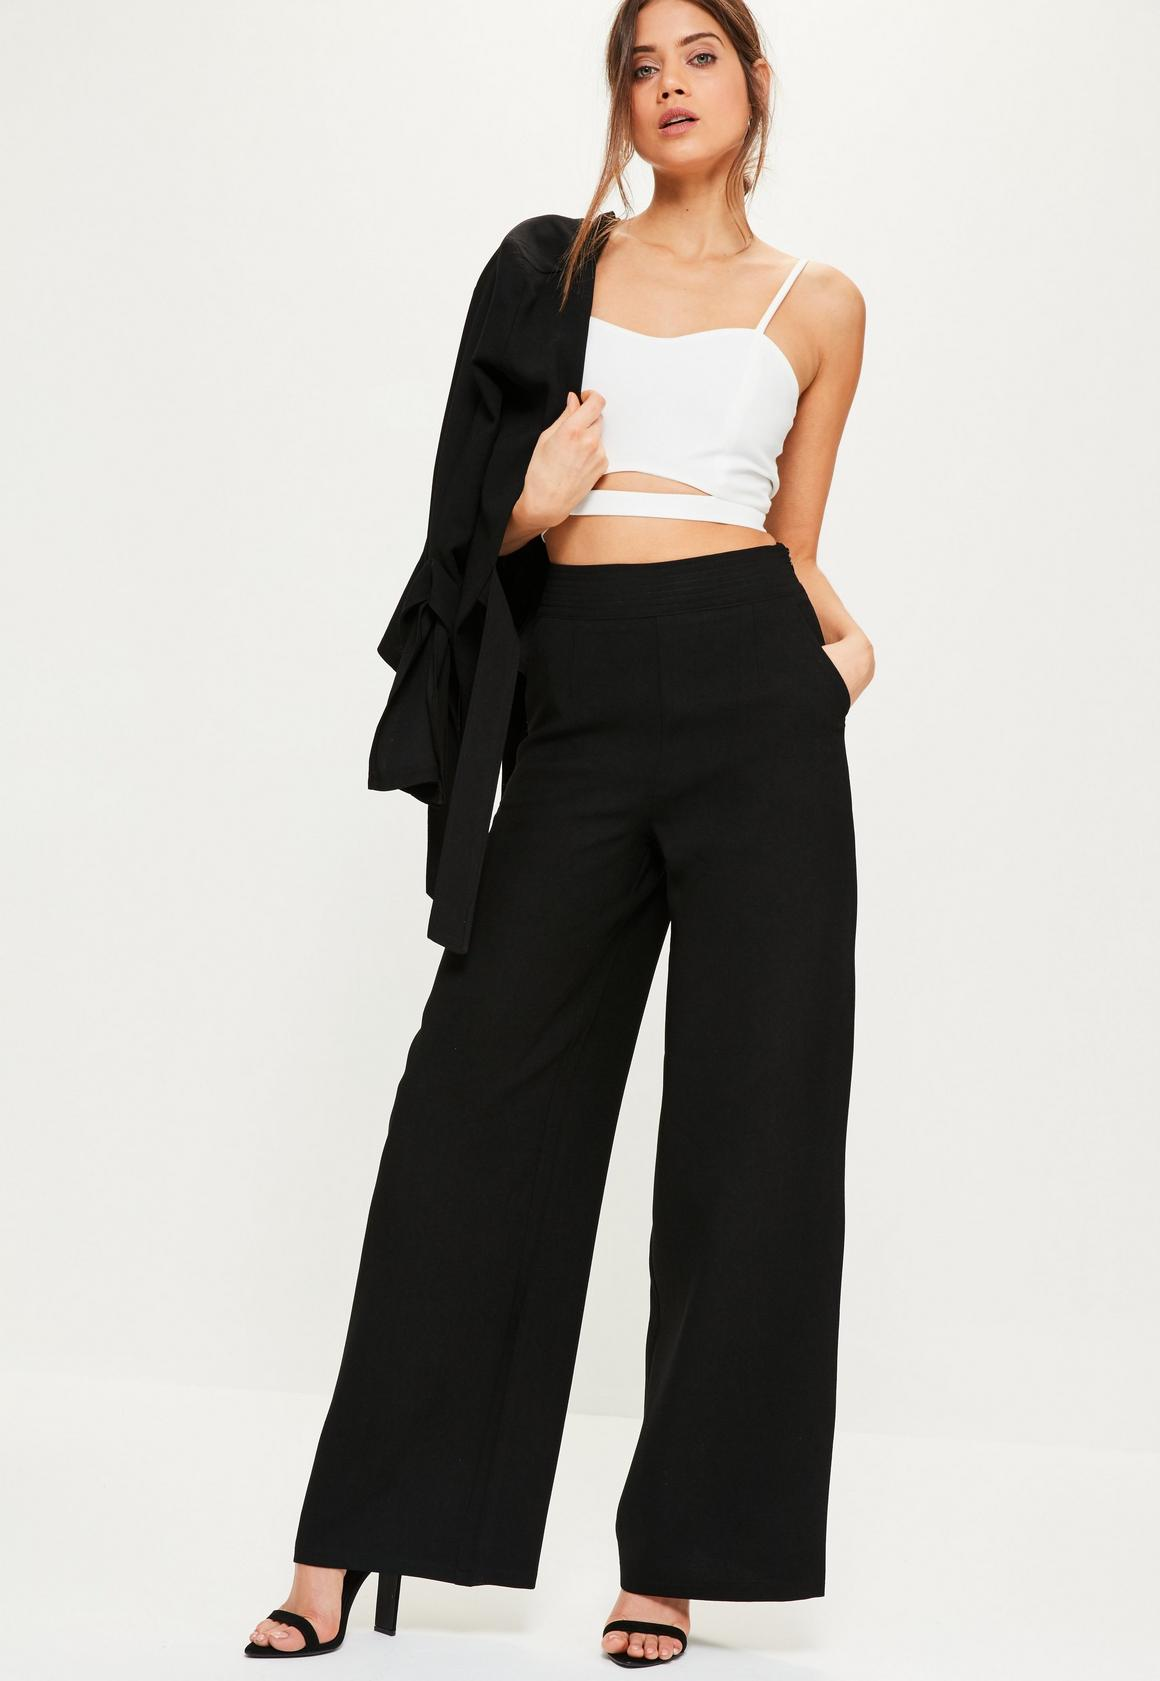 work clothes women s office wear missguided black crepe suit wide leg trousers